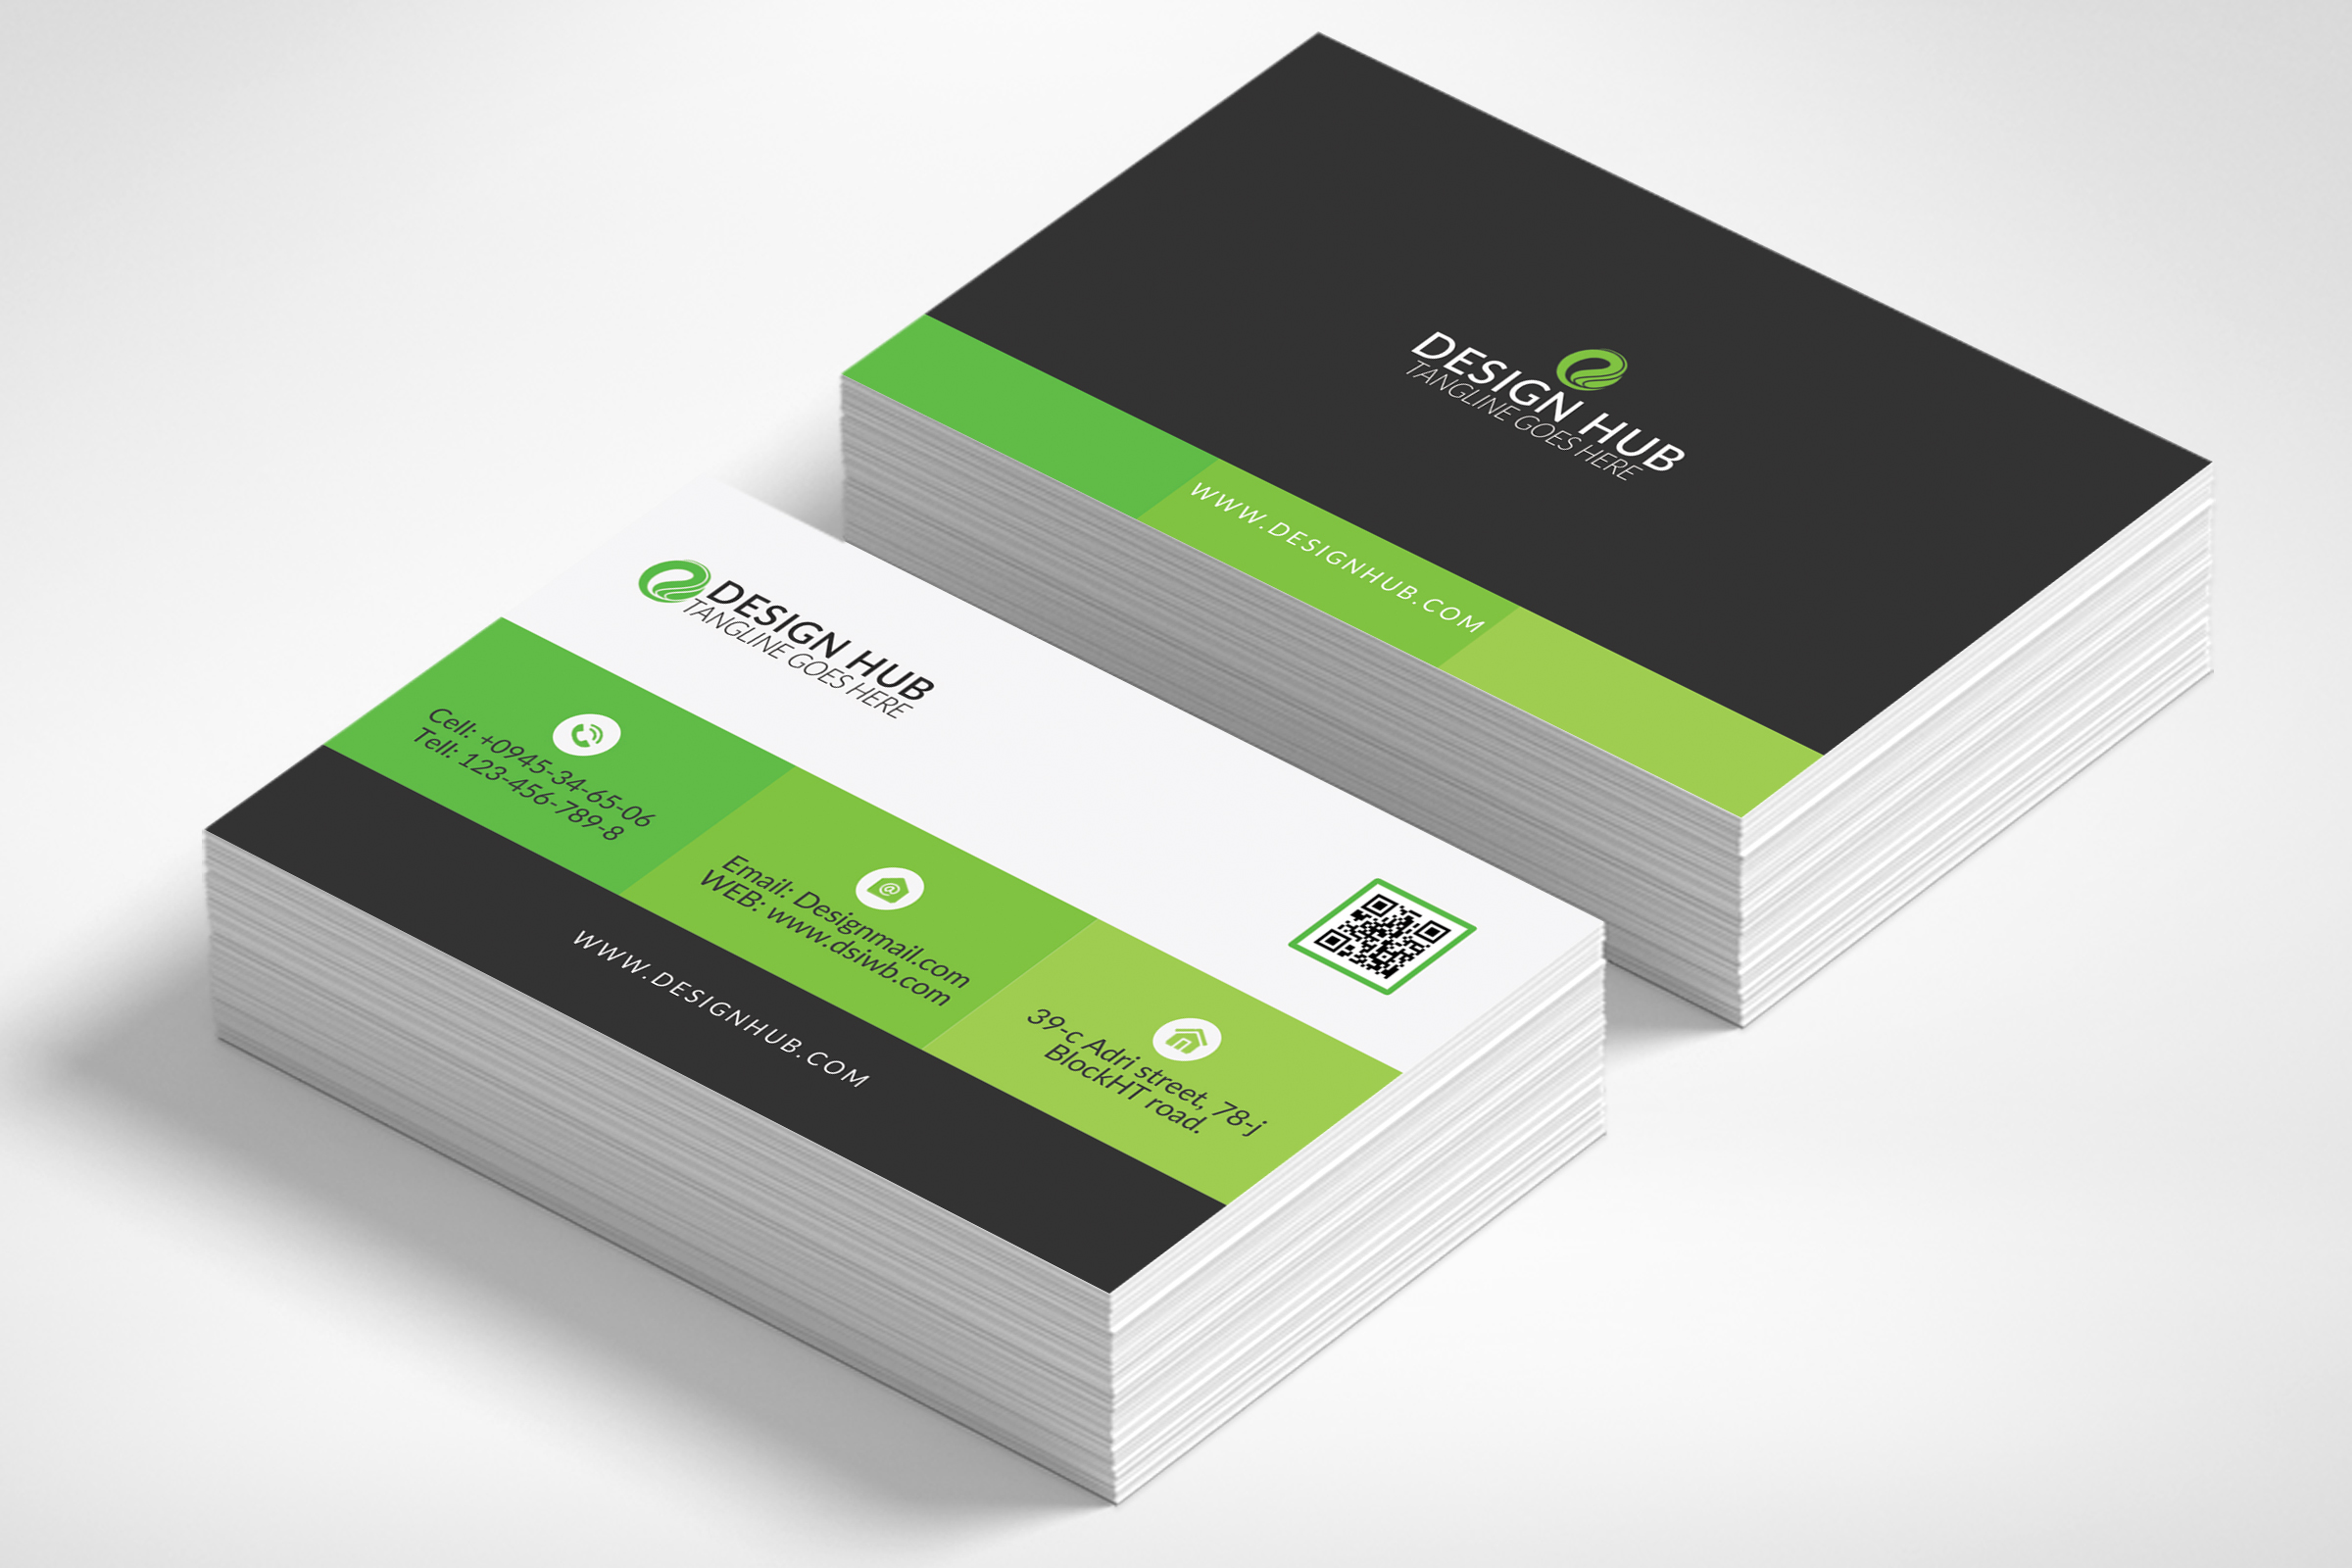 Business card template business card template example image 1 accmission Choice Image